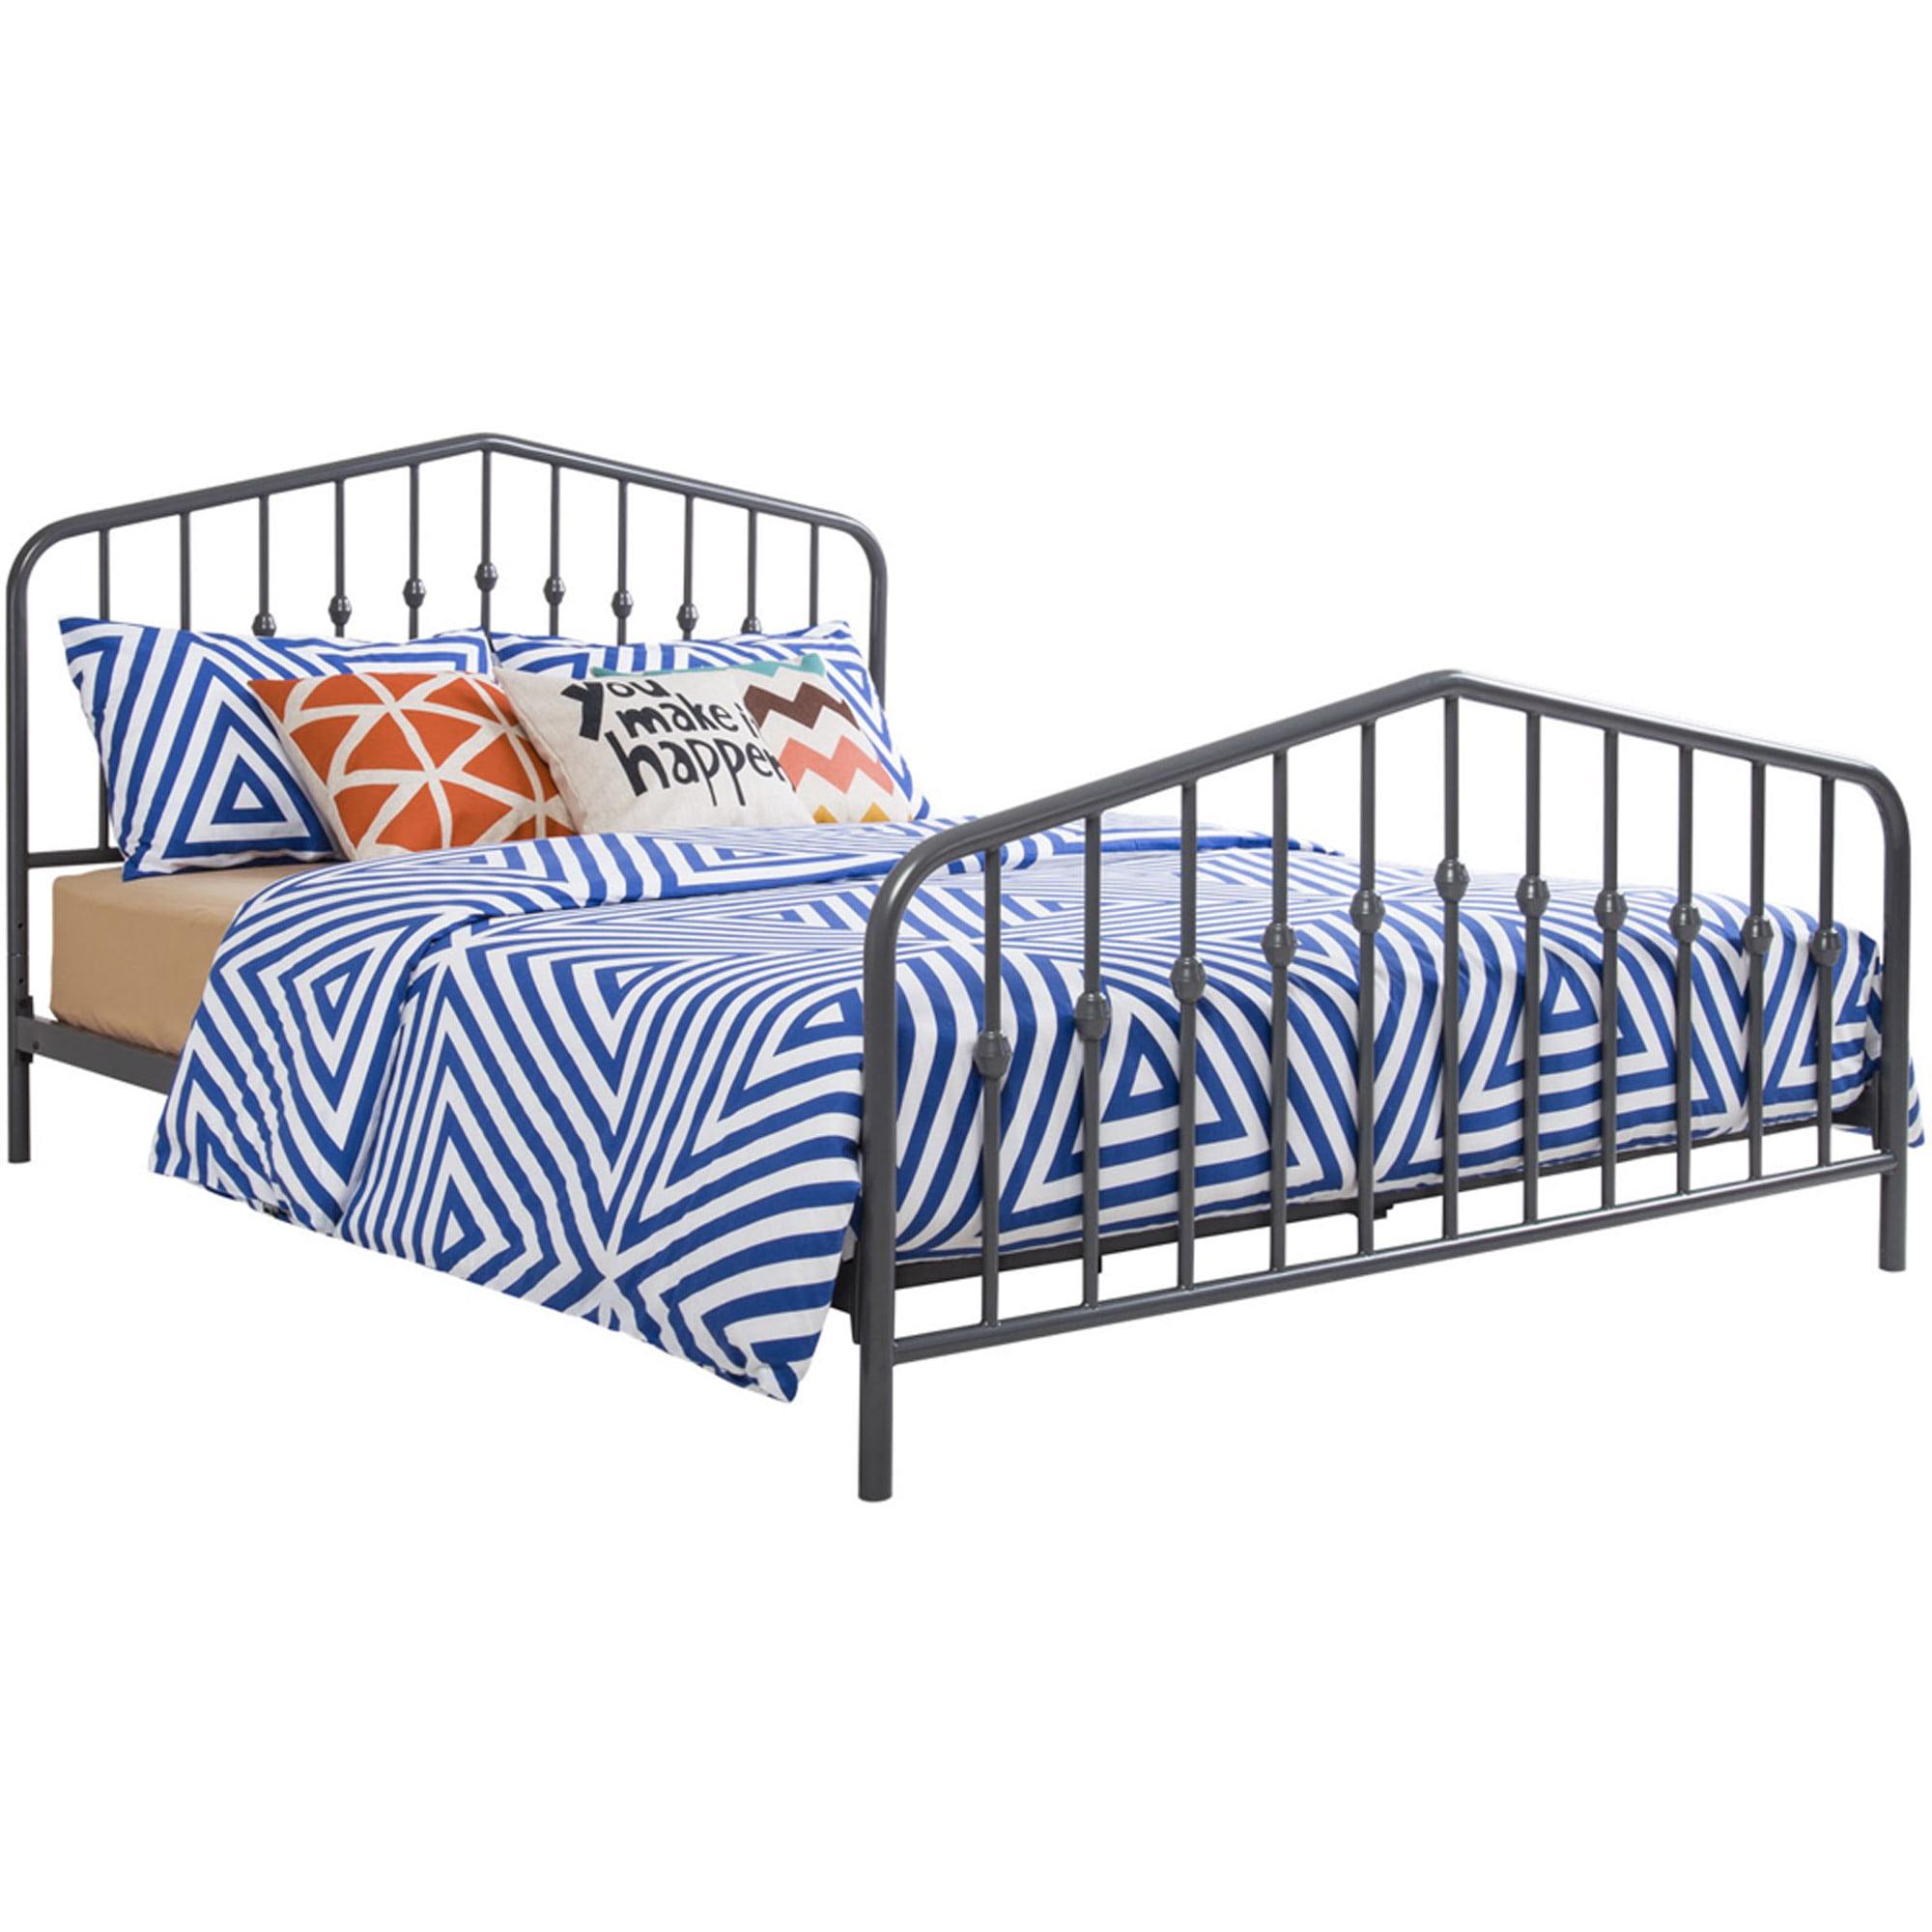 Novogratz Bushwick Metal Bed, Multiple Colors and Sizes - Walmart.com